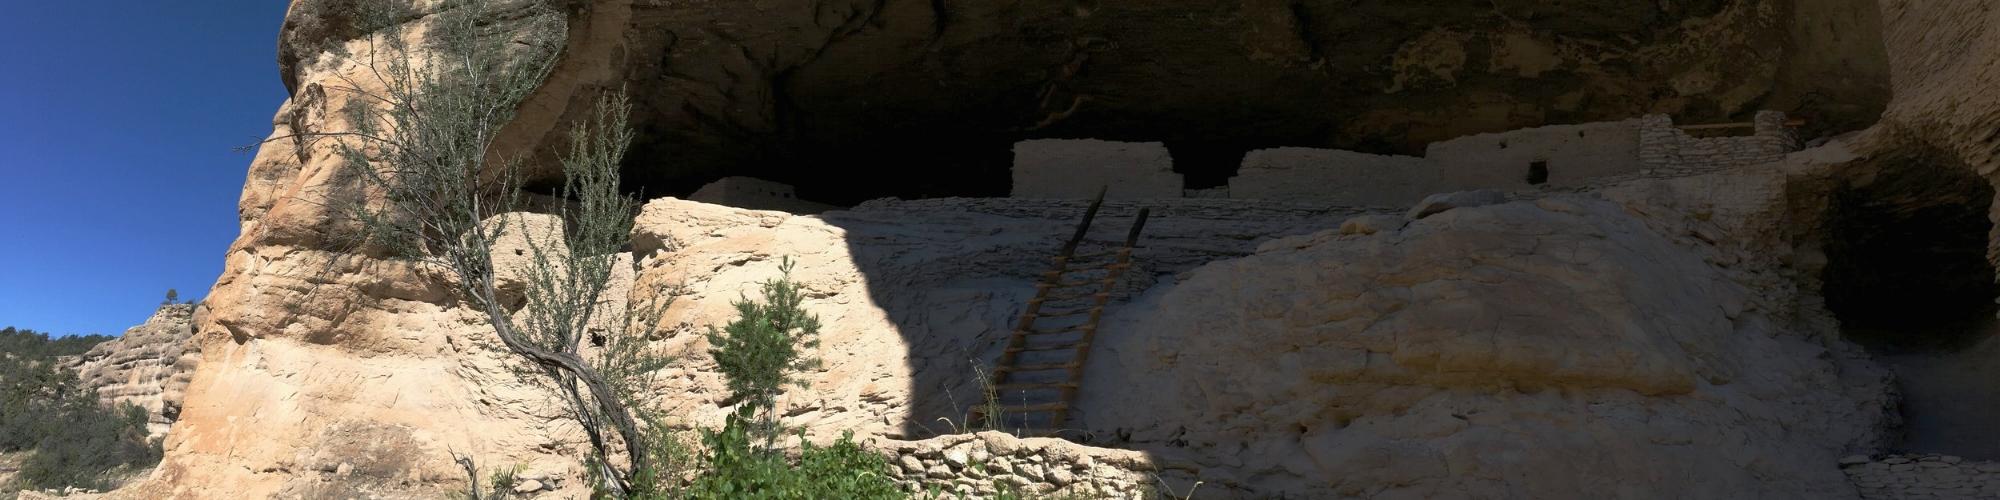 Gila Cliff Dwellings.JPG